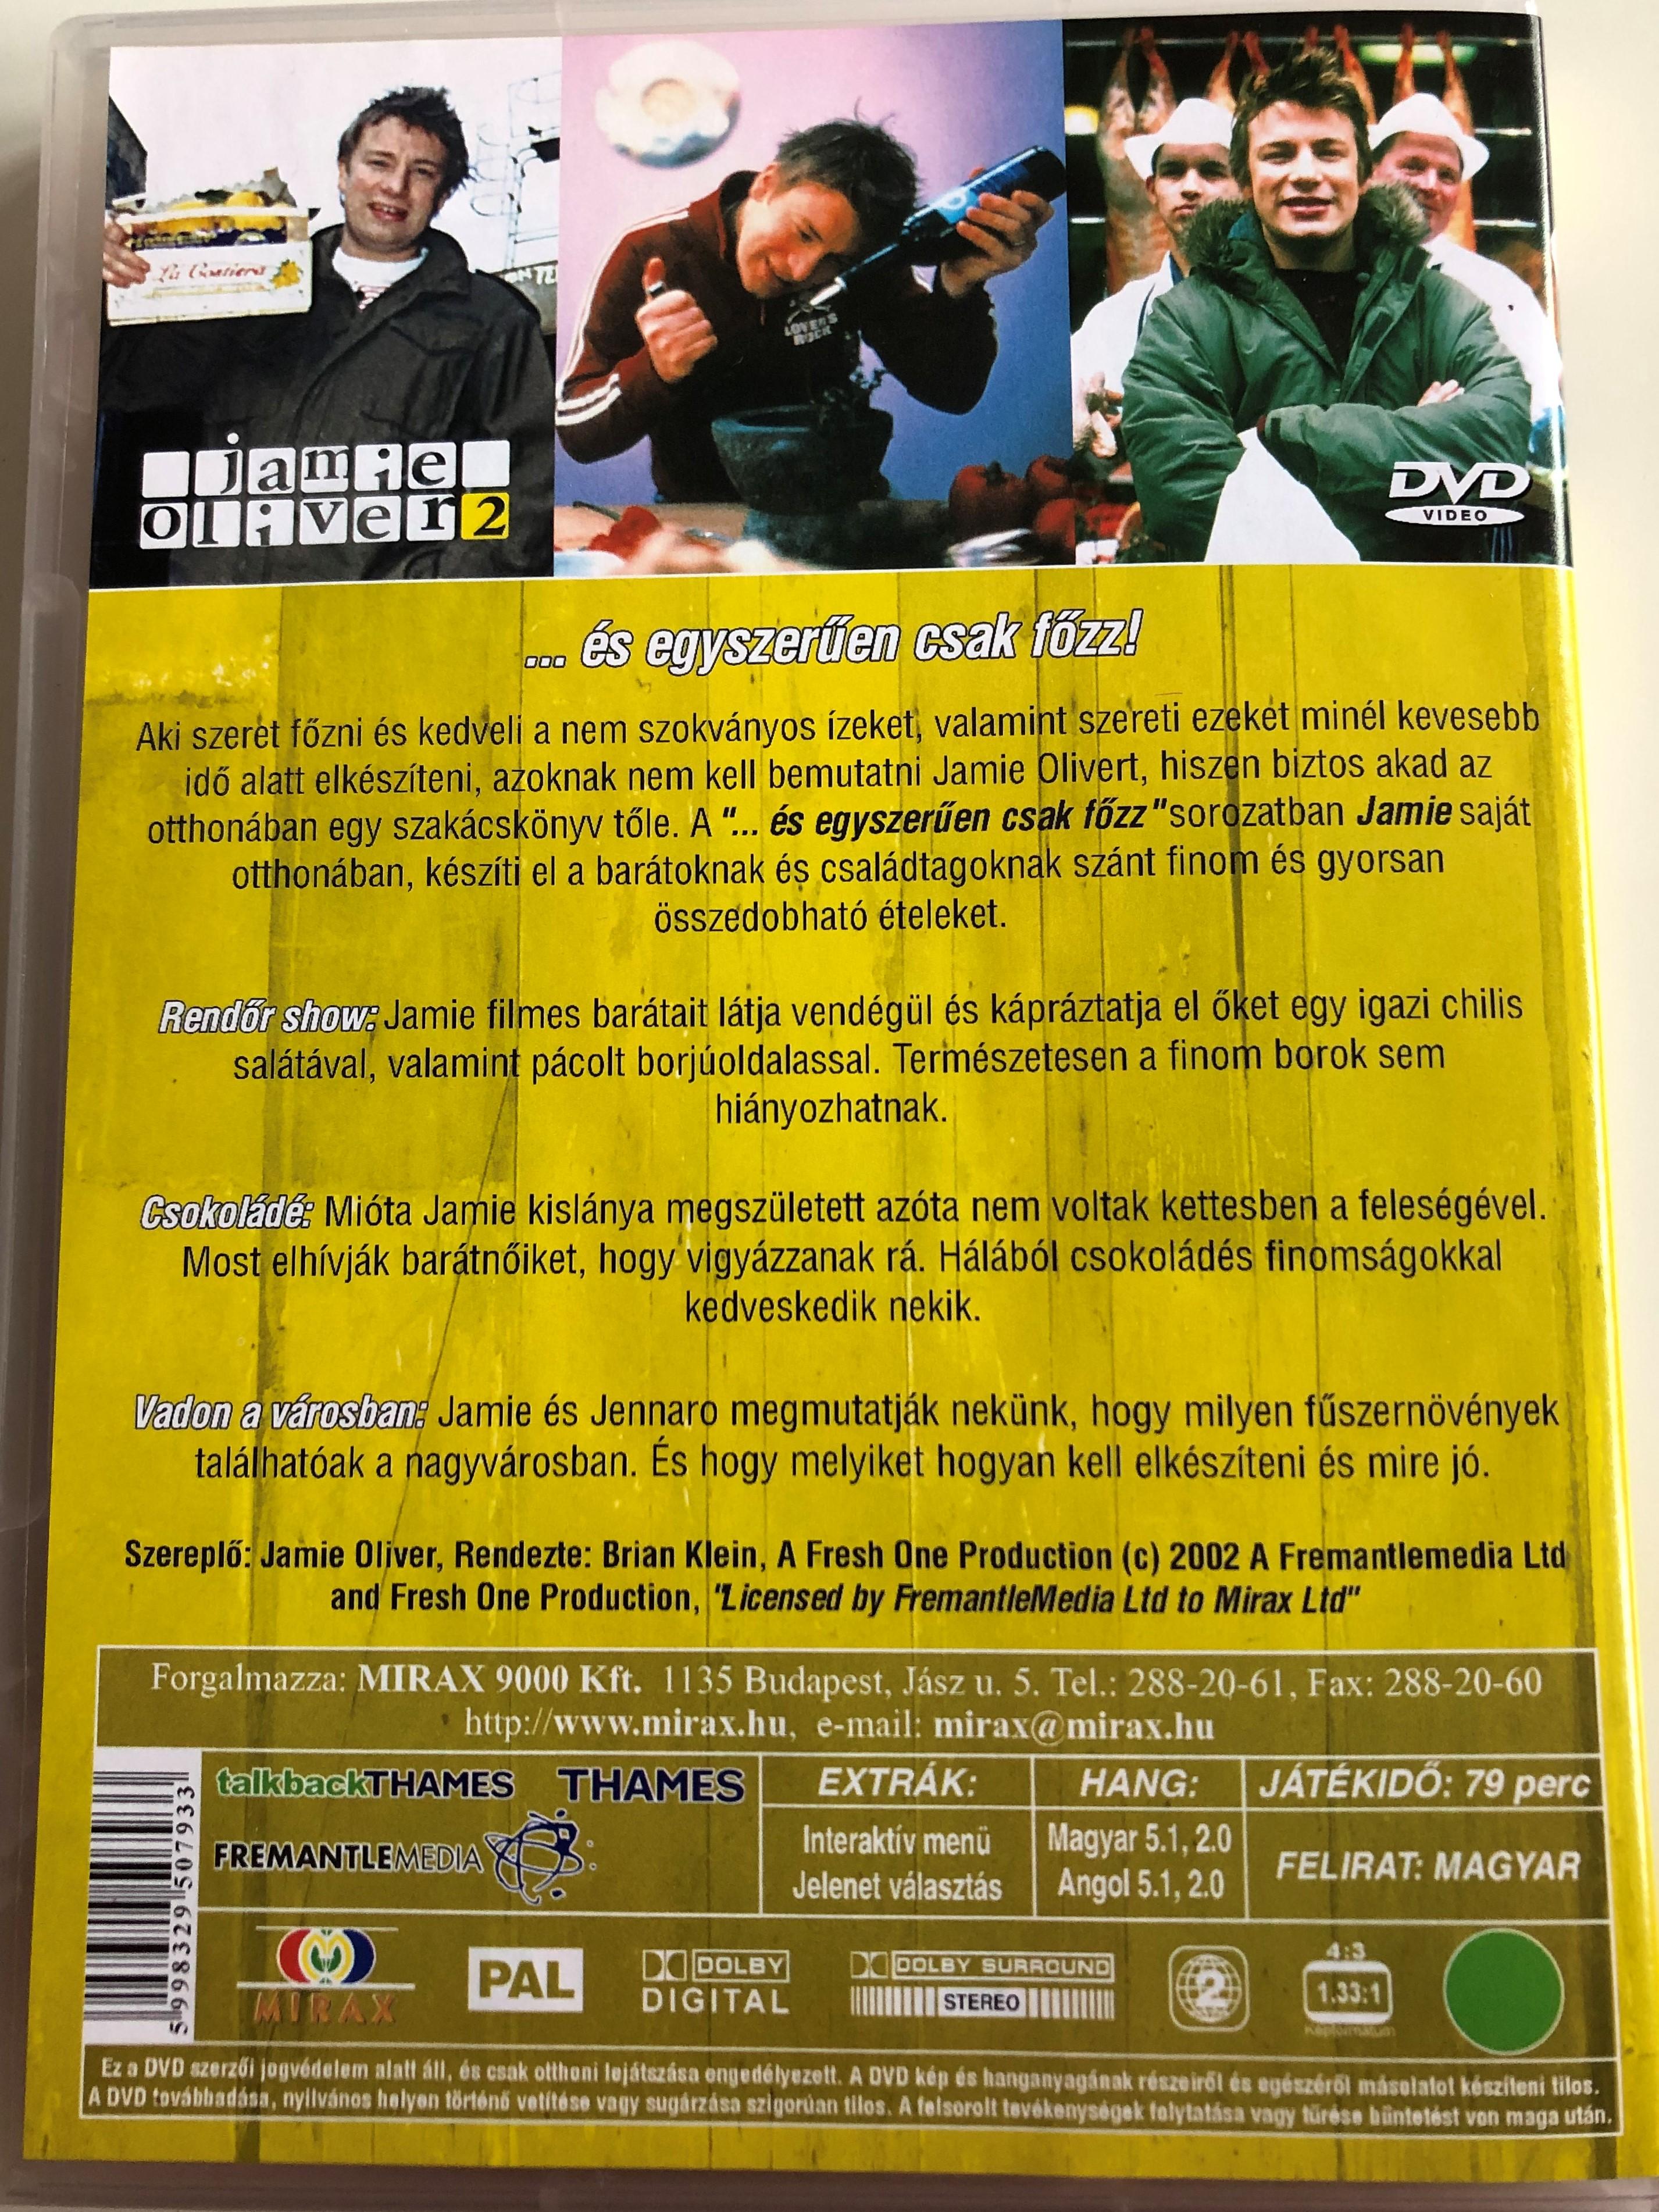 -oliver-s-twist-dvd-2002-jamie-oliver-vol.-2-3.jpg